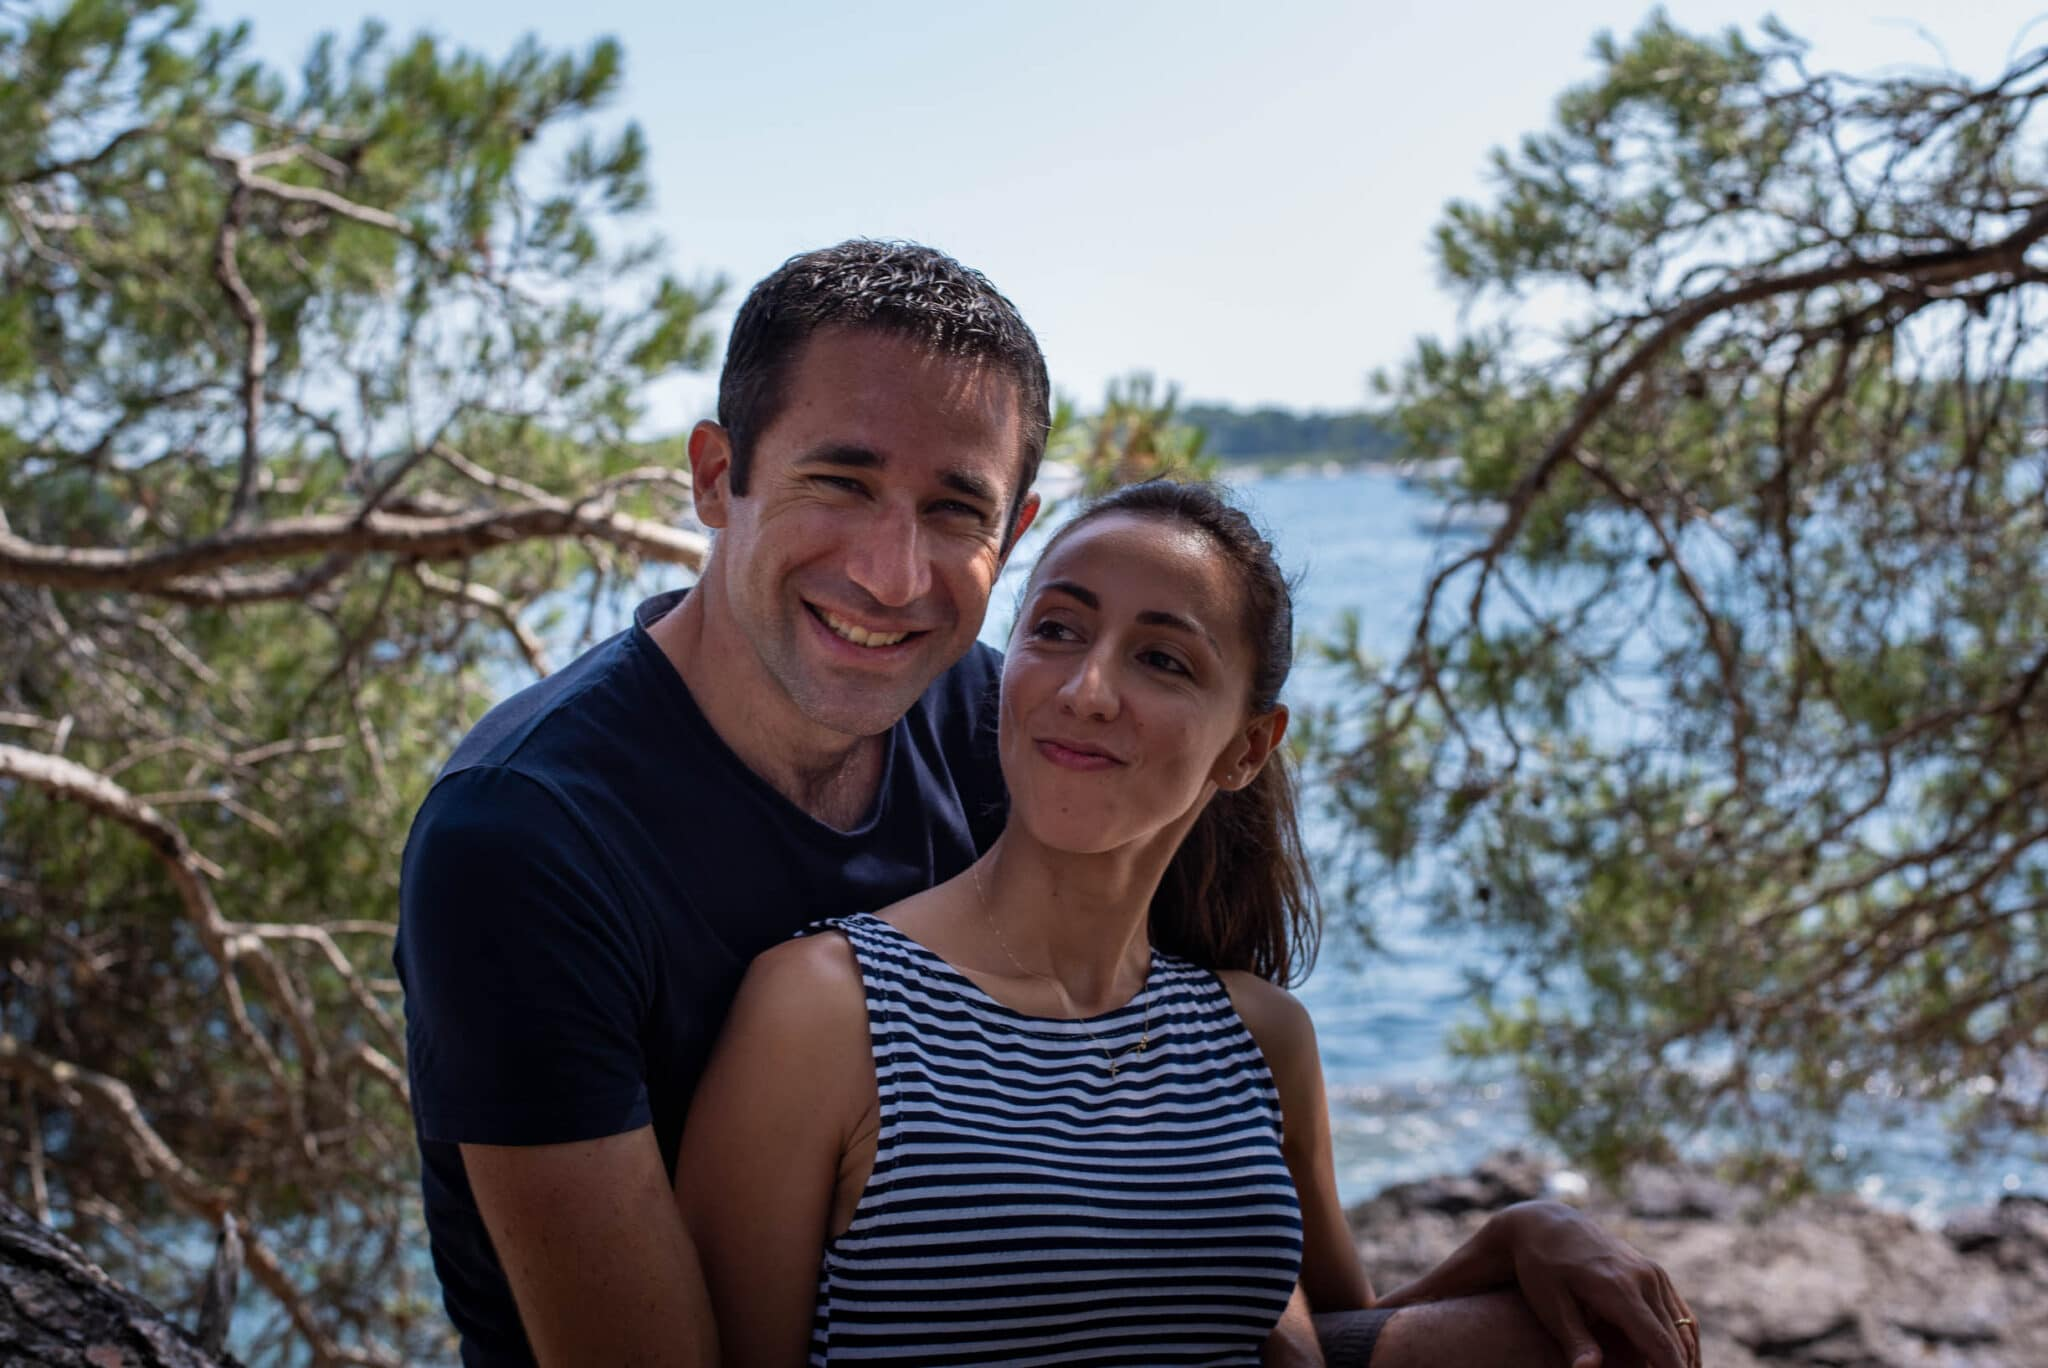 Joanne and François on Sainte-Marguerite Island